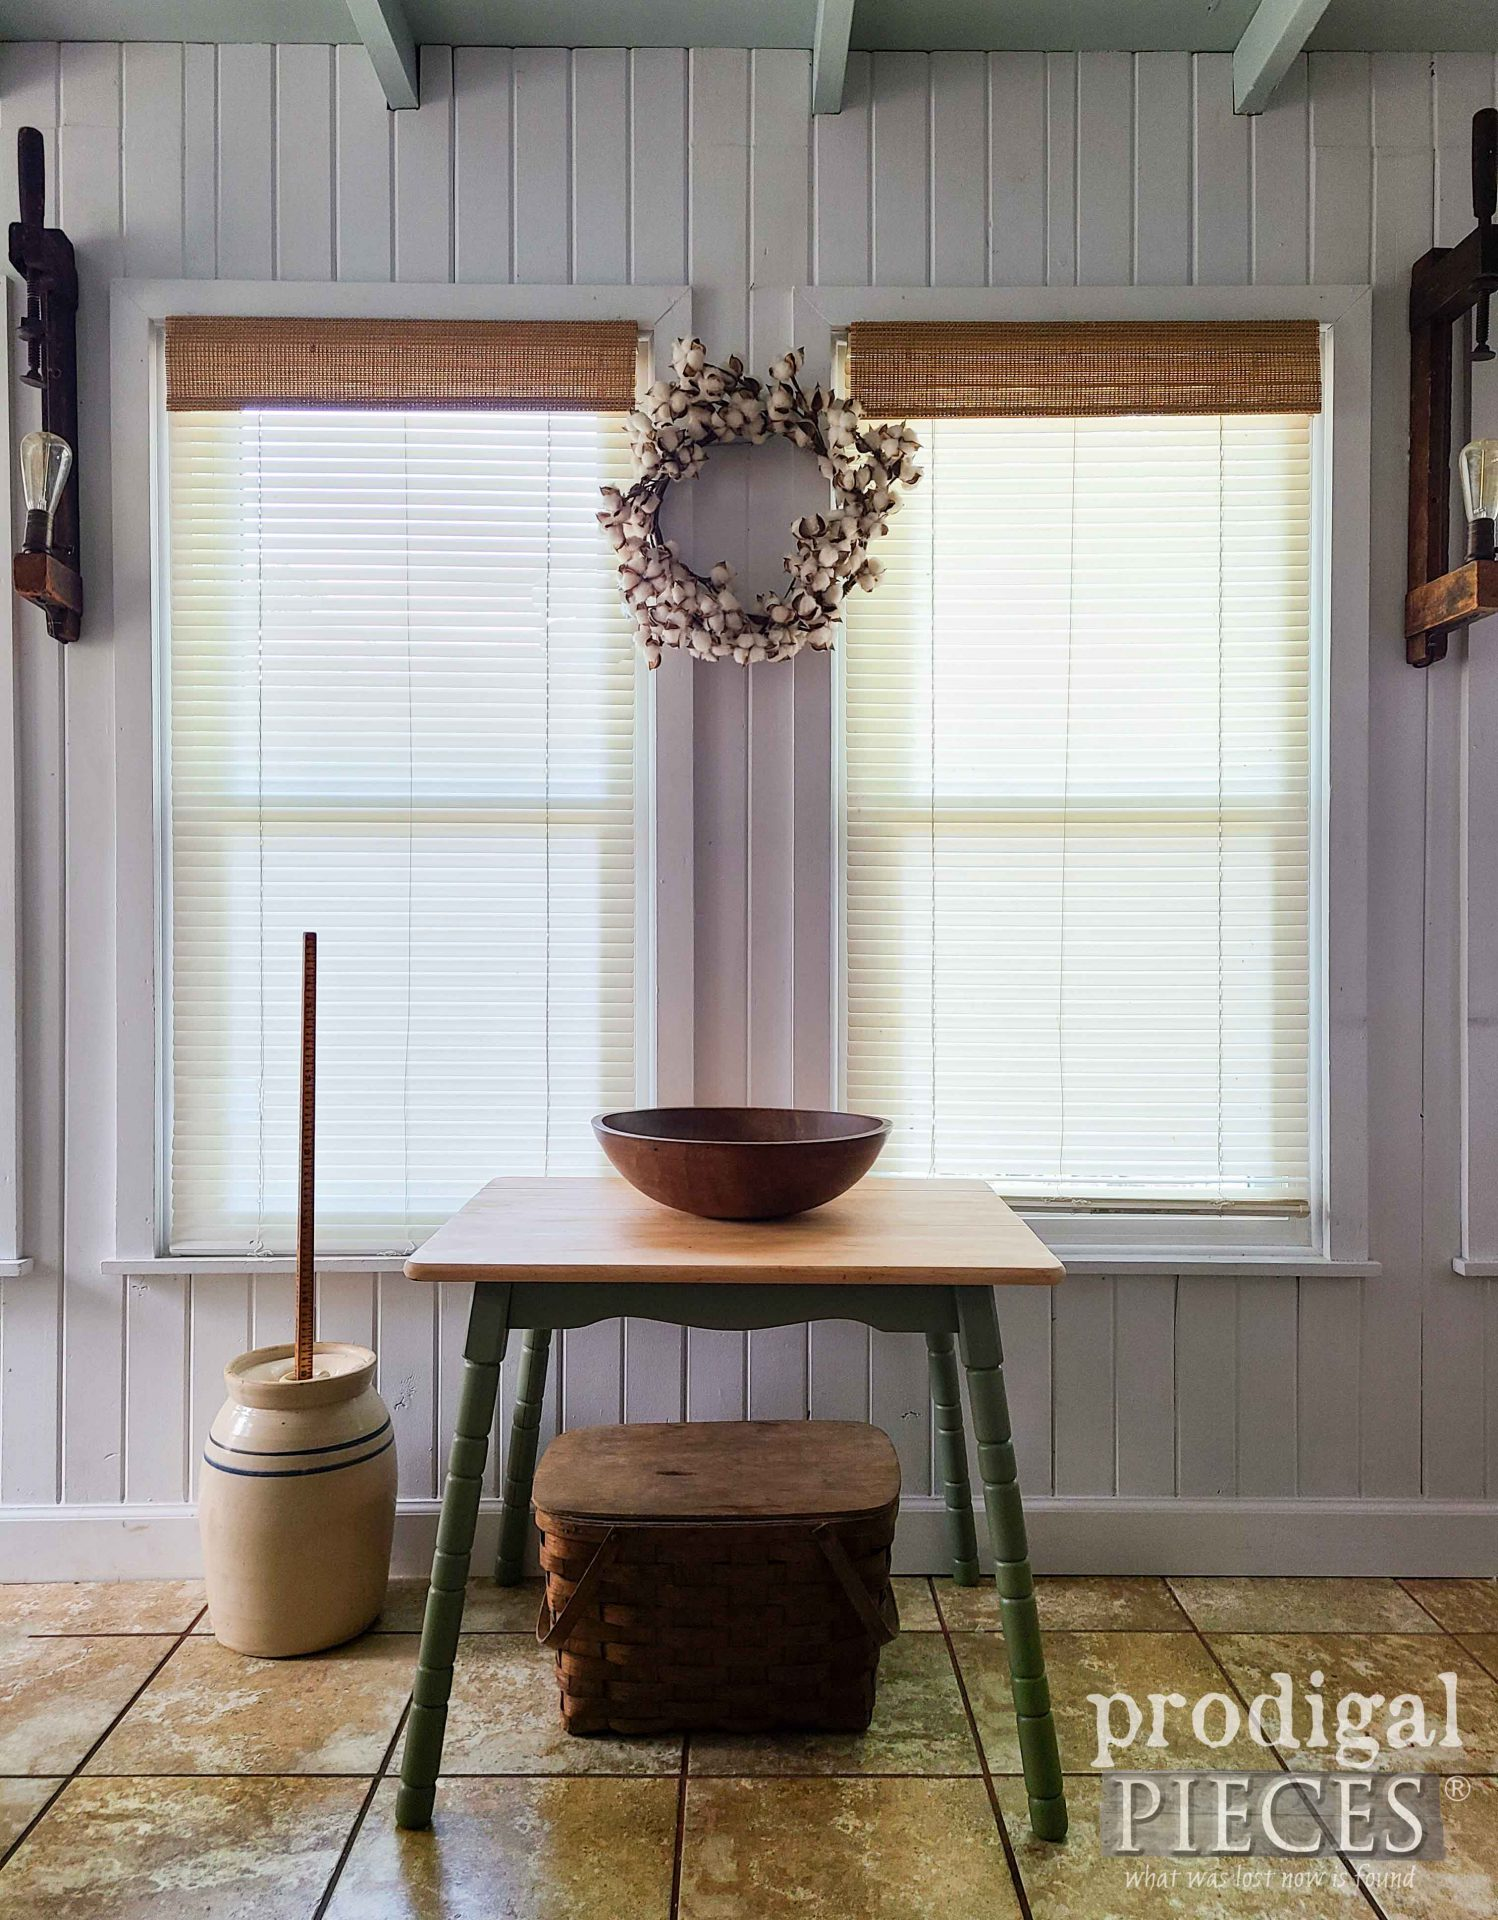 Sweet Vintage Mini Farmhouse Table get update by Larissa of Prodigal Pieces   prodigalpieces.com #prodigalpieces #farmhouse #furniture #home #table